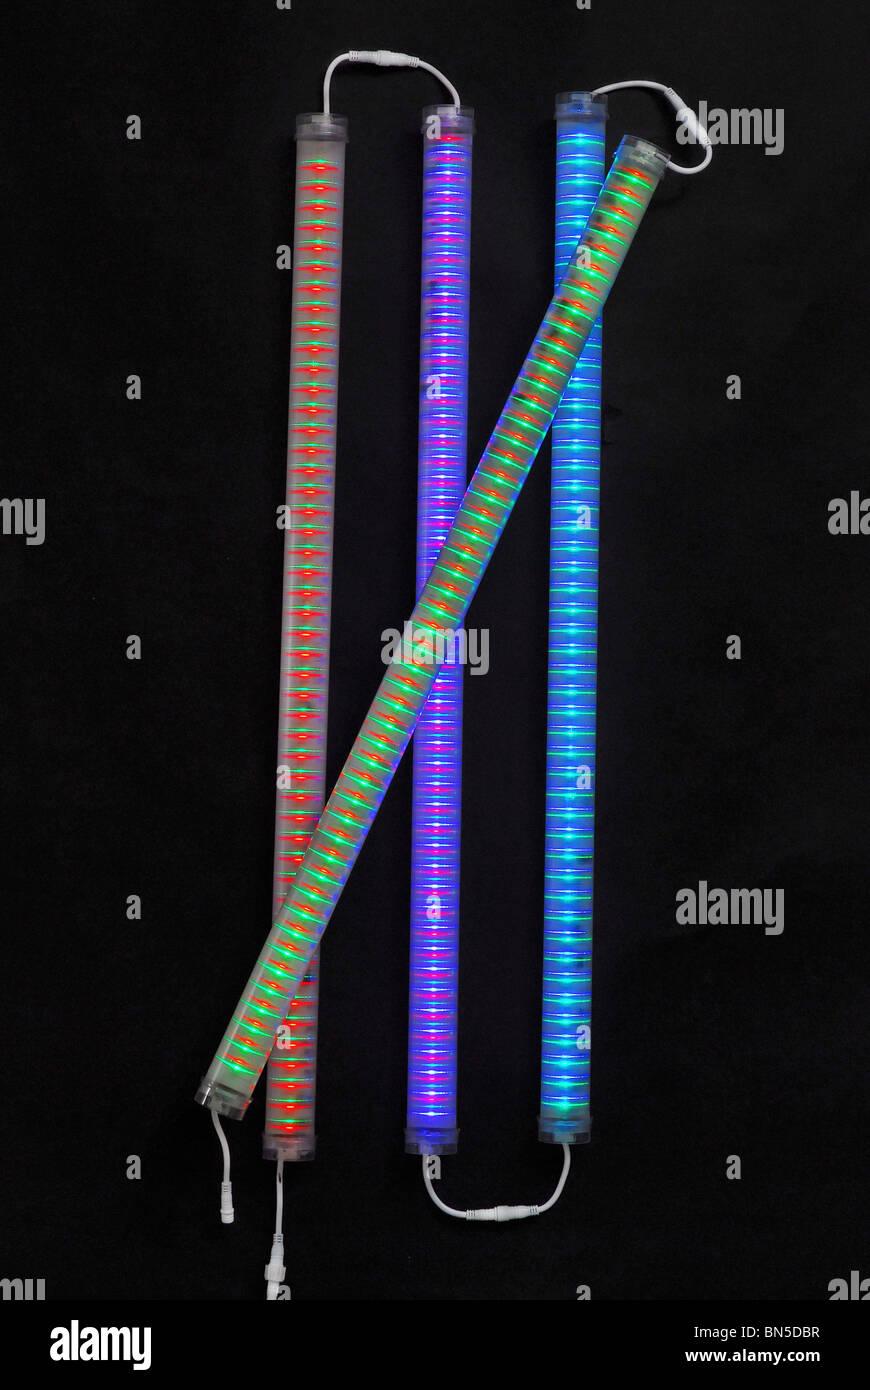 Colourful LED Light Fixture - Stock Image